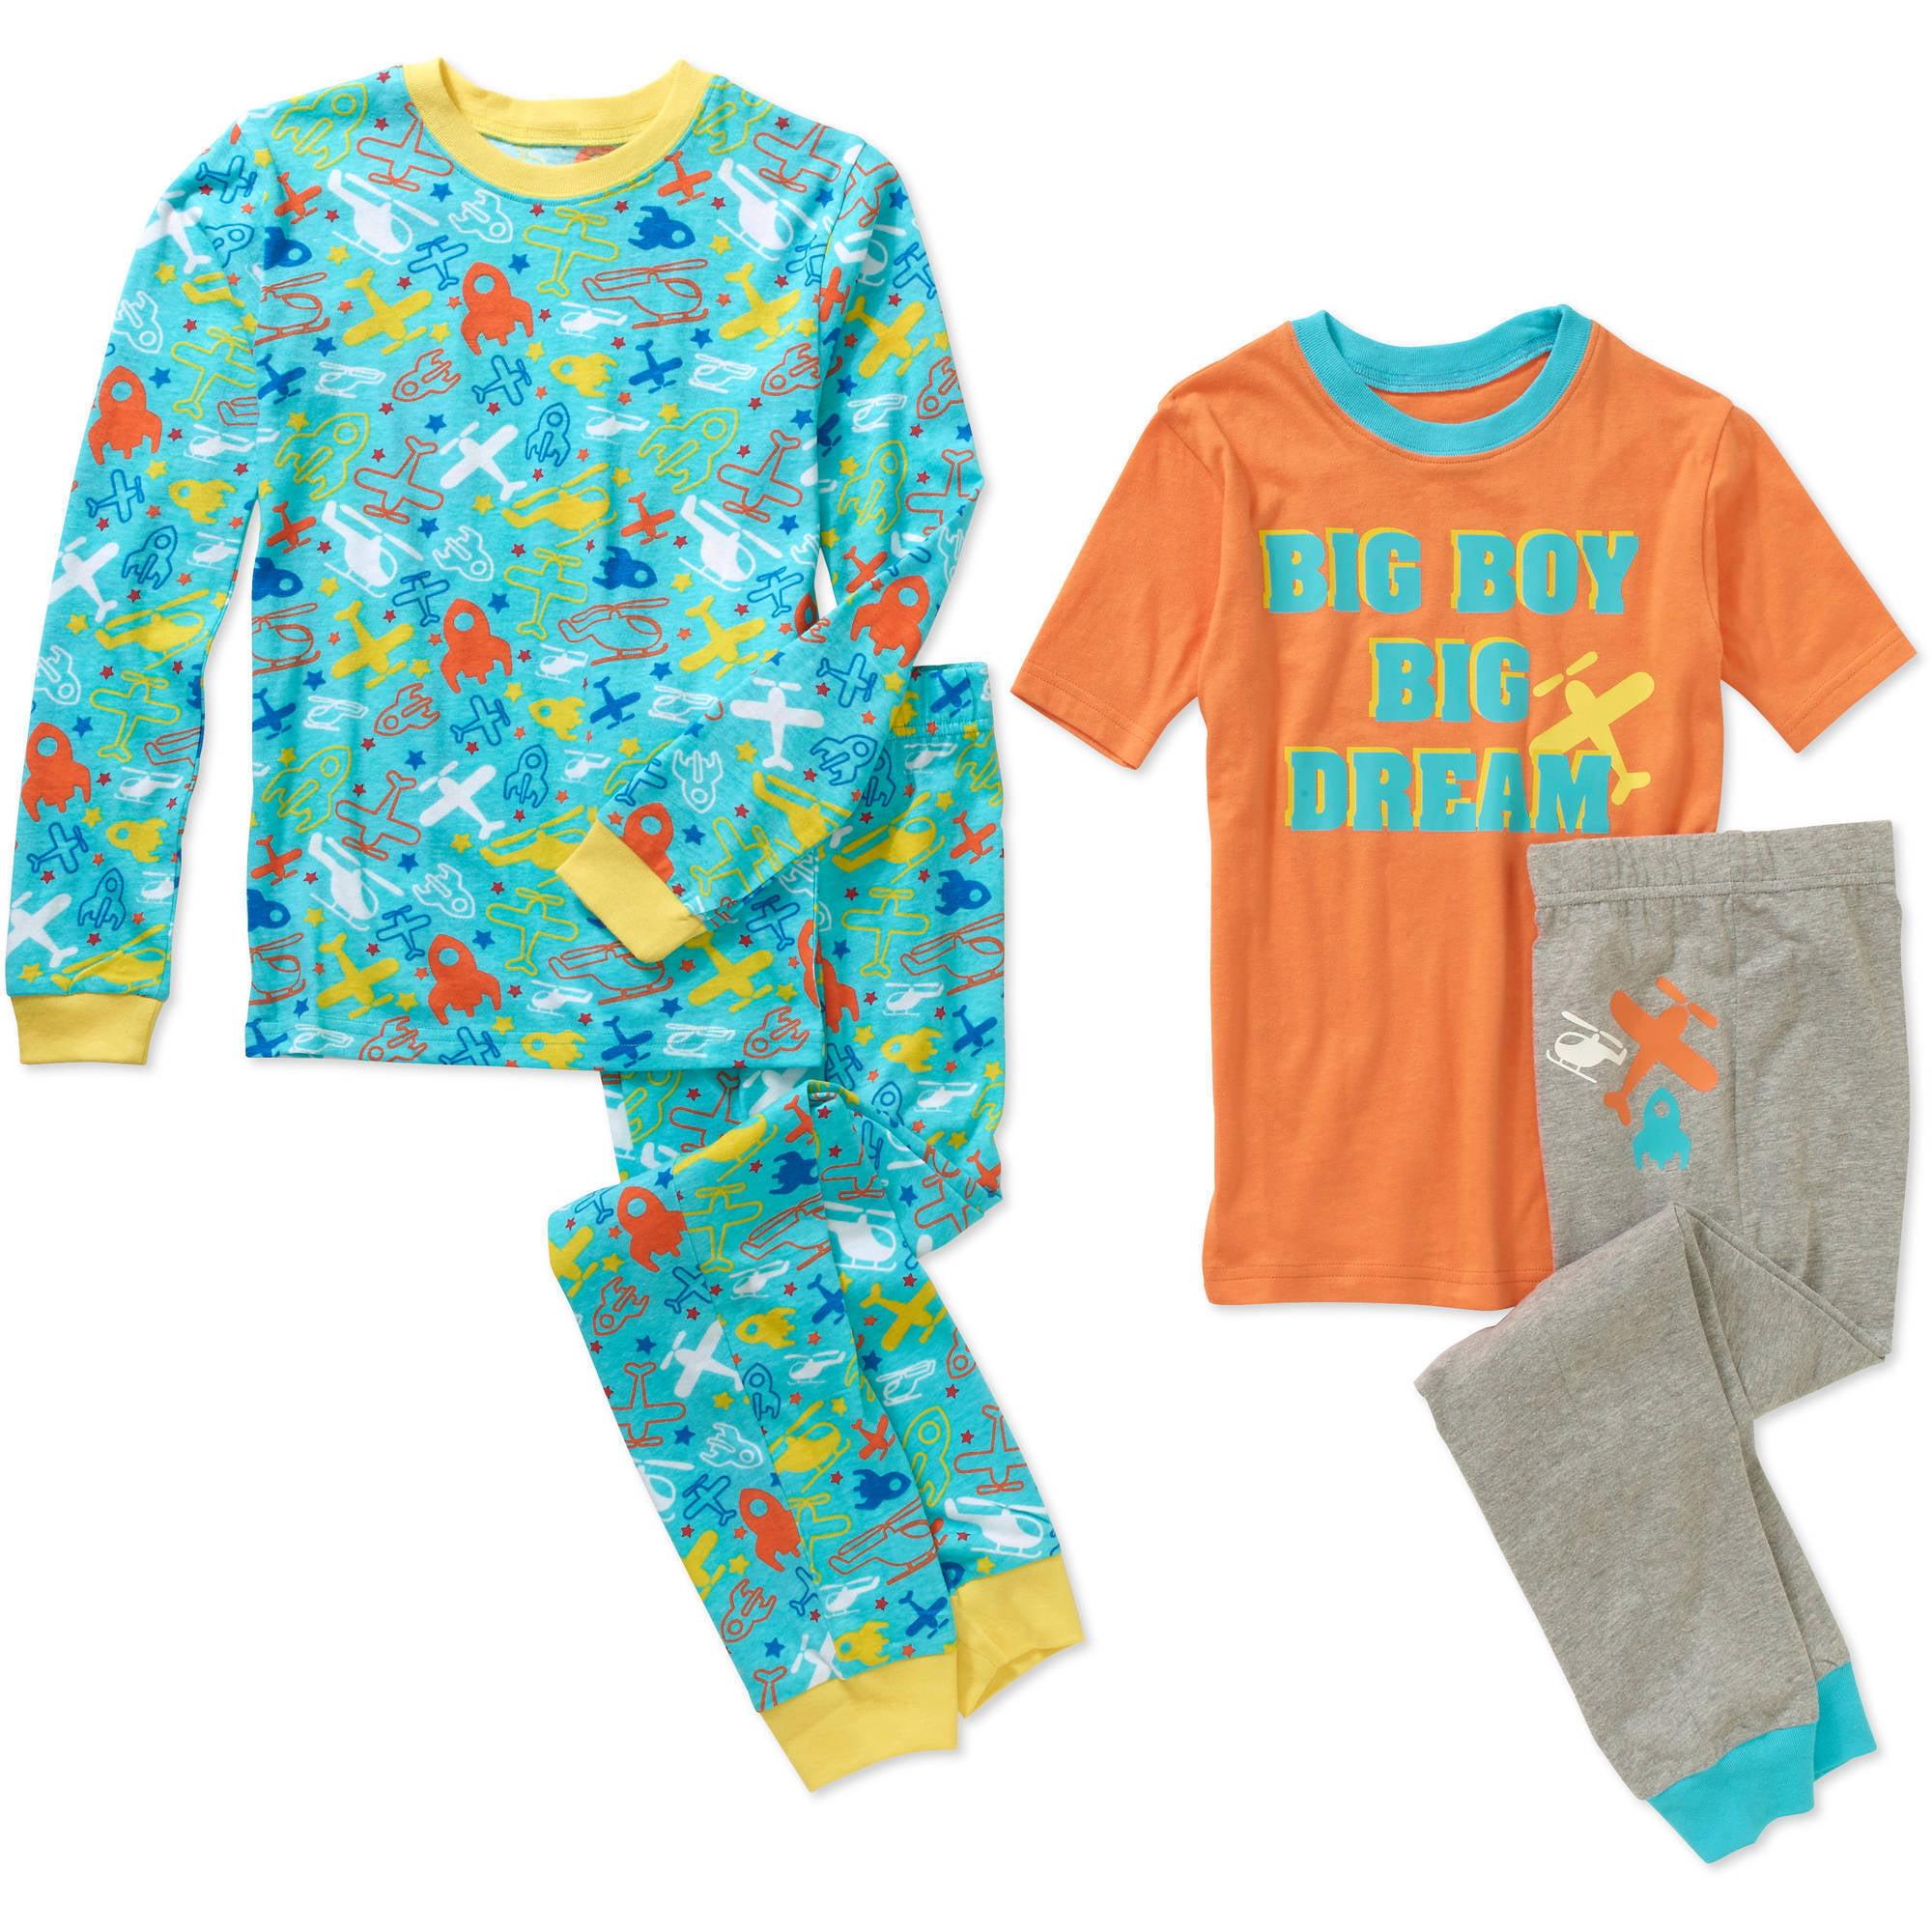 Boys' 4 Piece Cotton Pajama Sleepwear Set, Available in 6 Prints